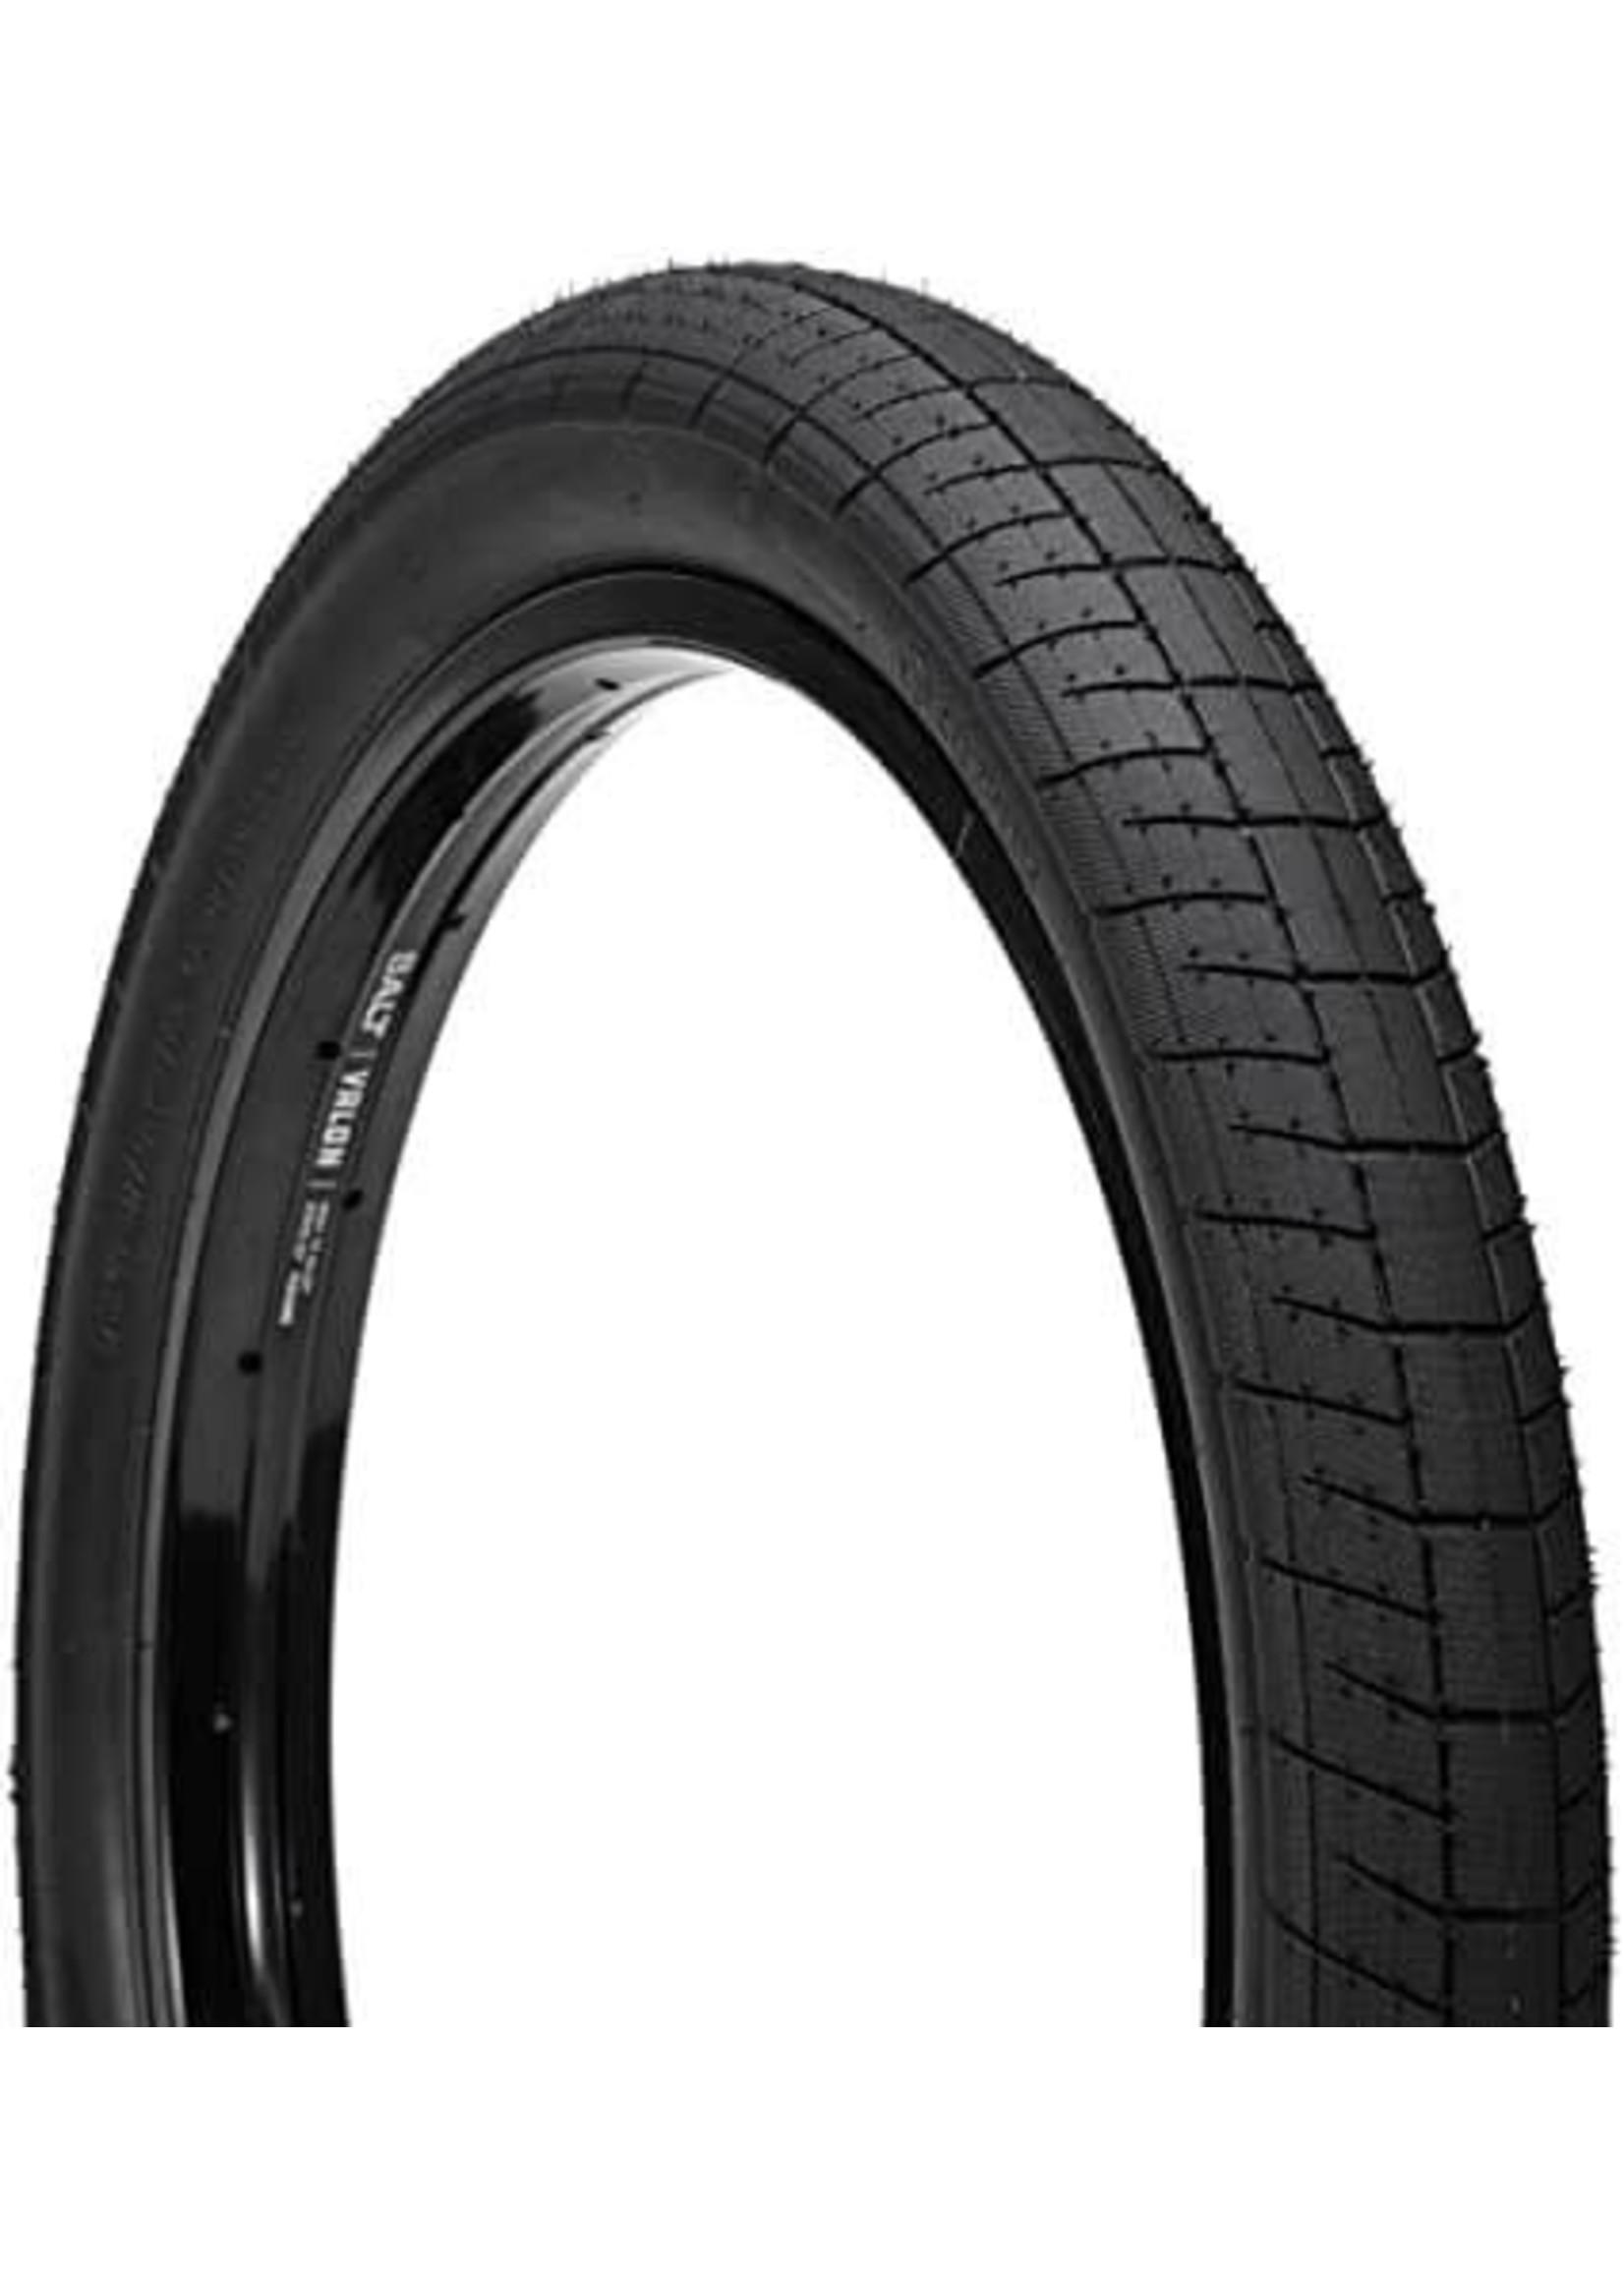 "Salt Salt Plus - Sting tire - 2.3"""